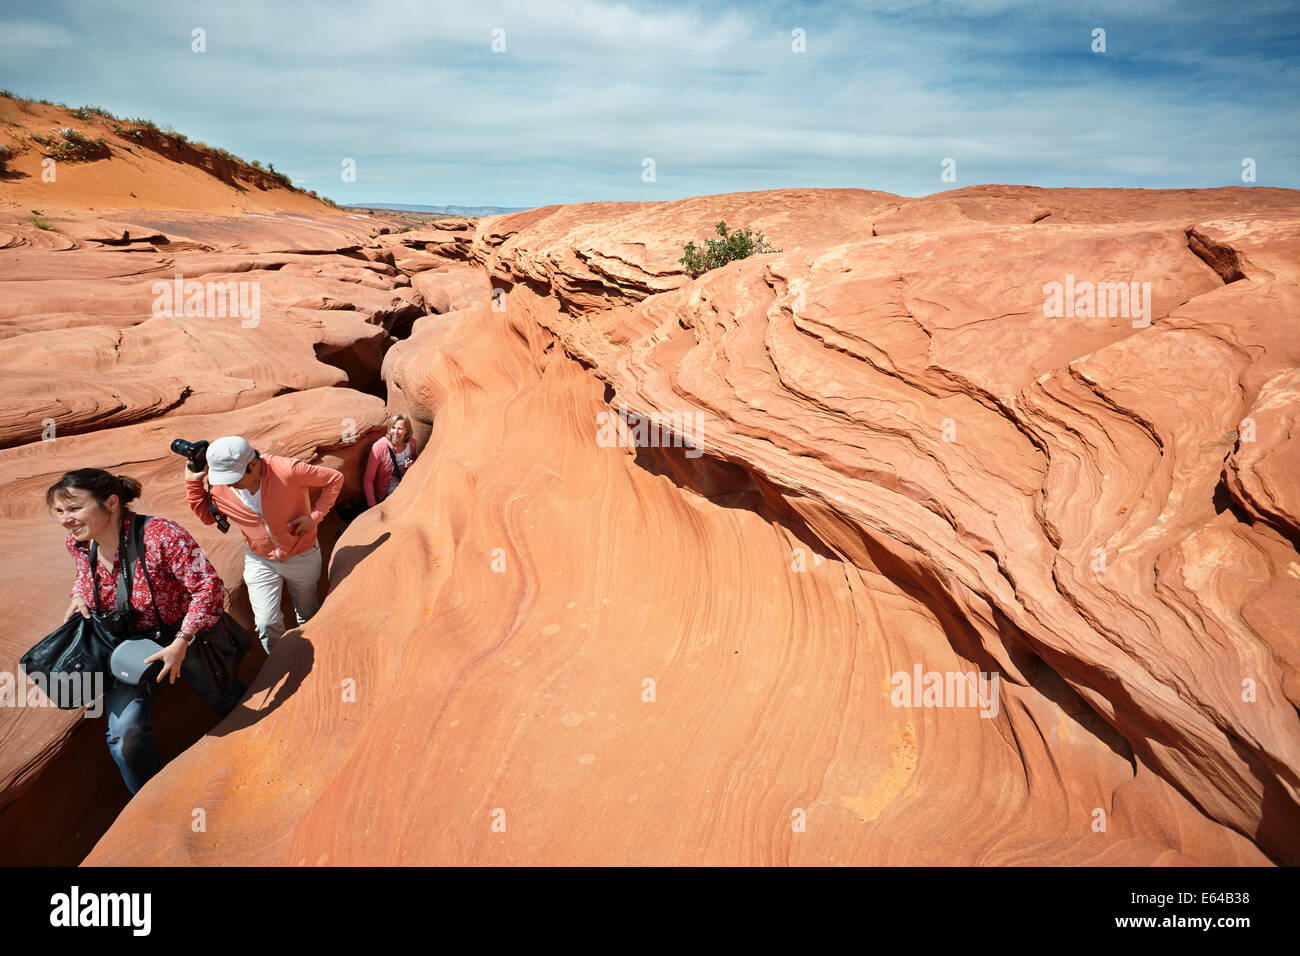 Lower Antelope Canyon entrance. Page, Arizona, USA. - Stock Image